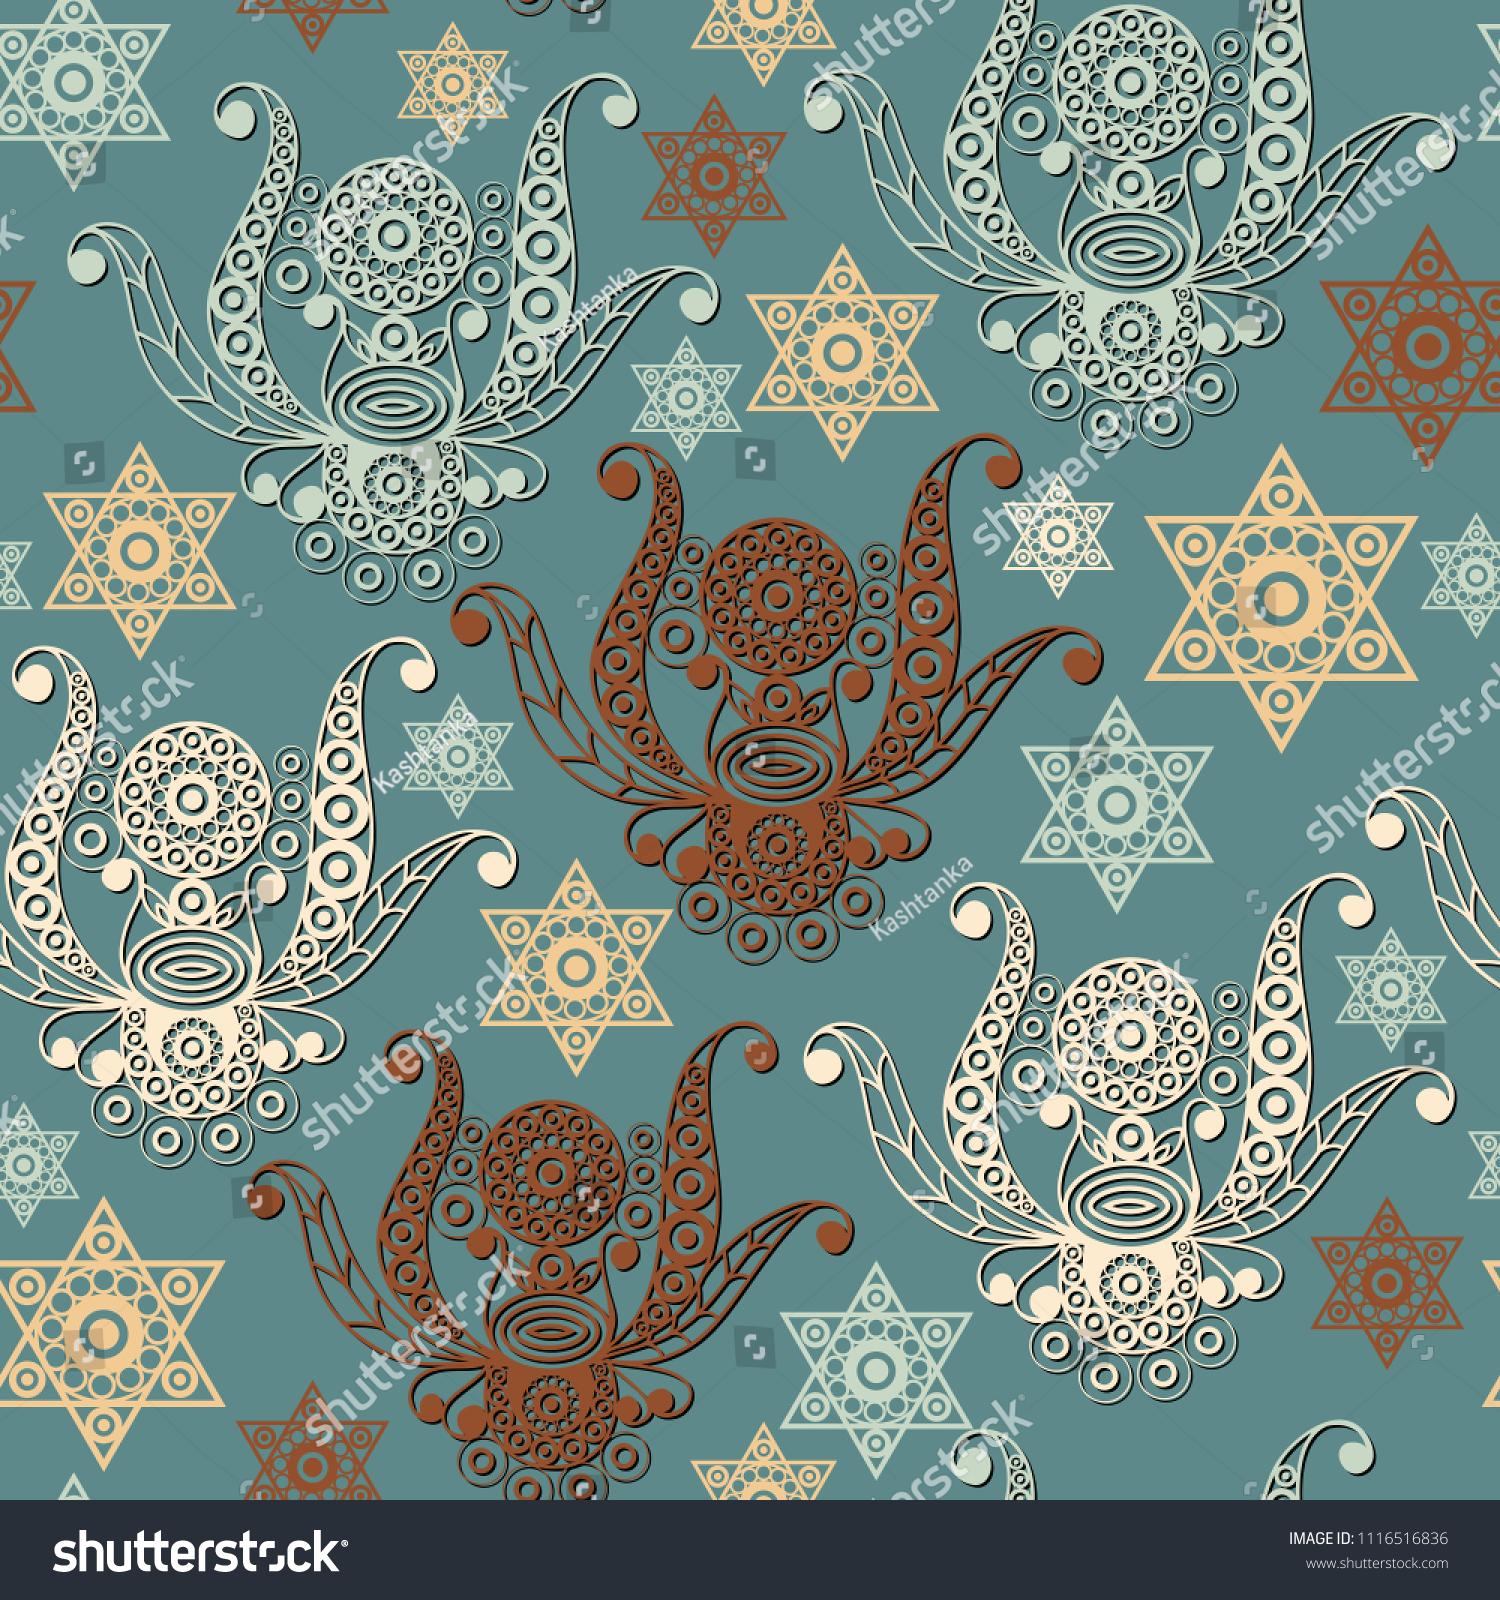 Seamless Background Occult Symbol Masonic Freemasonic Stock